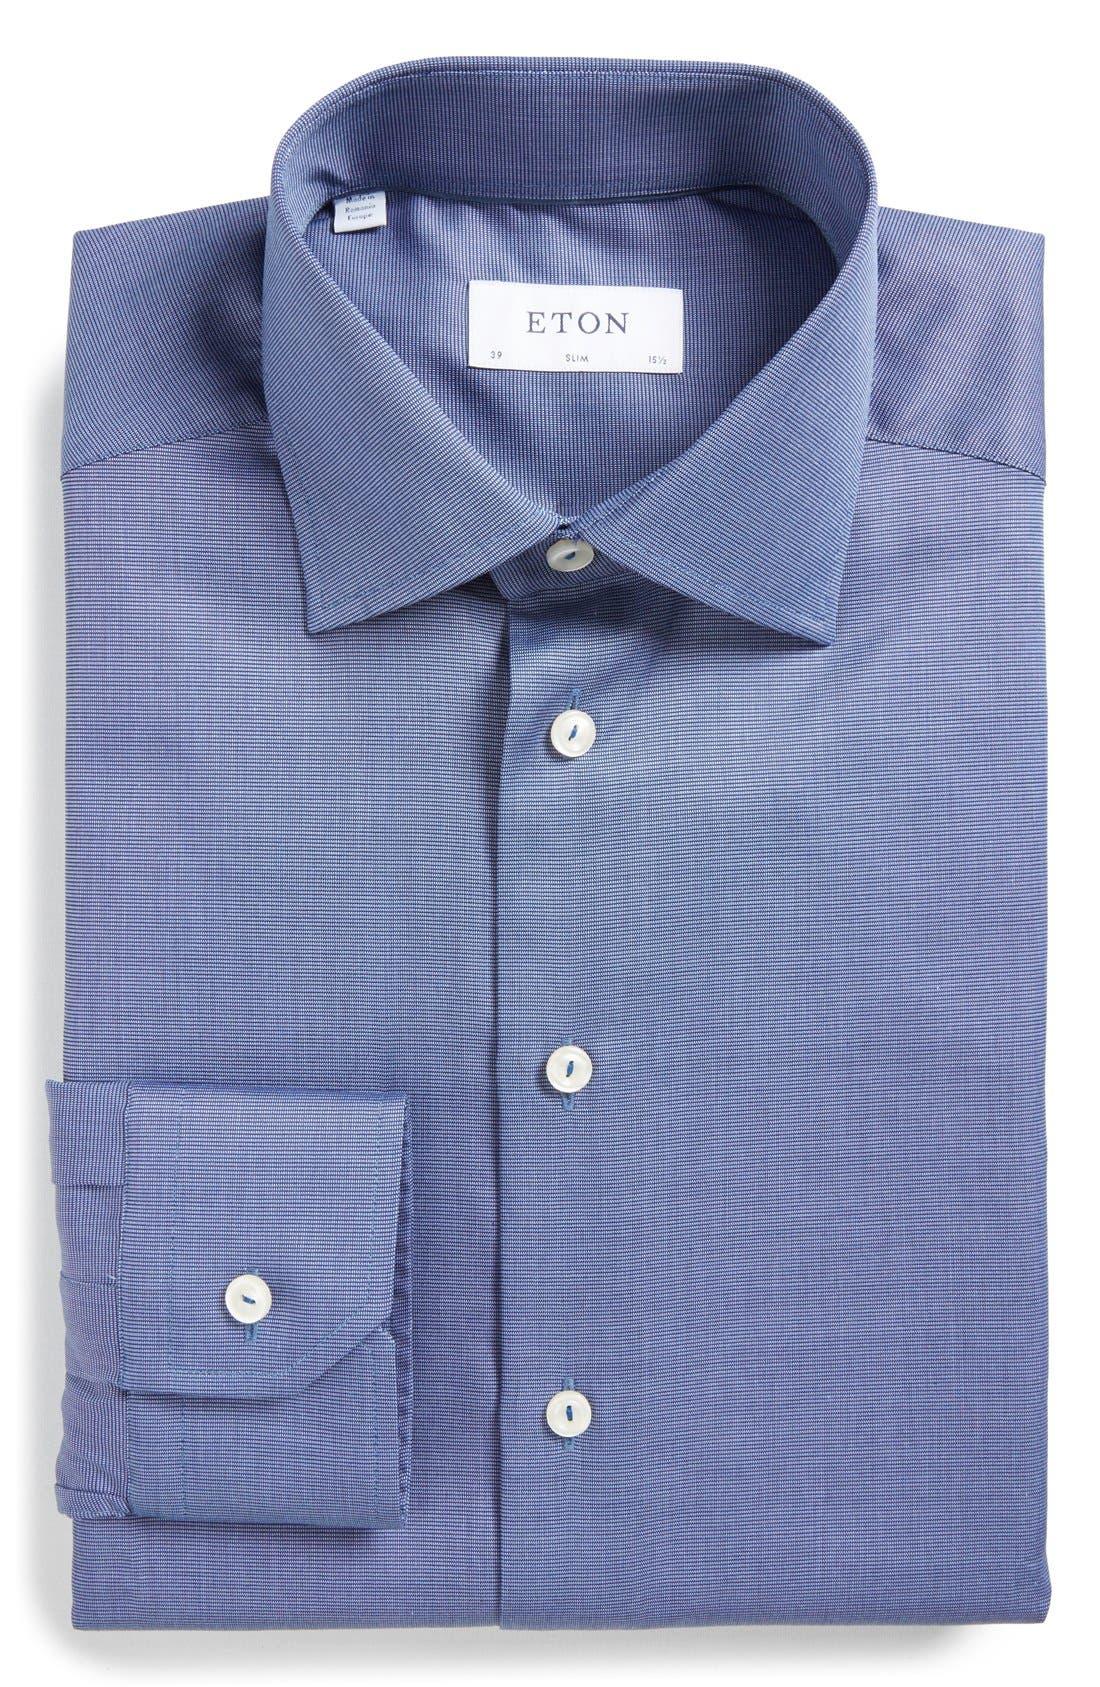 Main Image - Eton Slim Fit Solid Dress Shirt